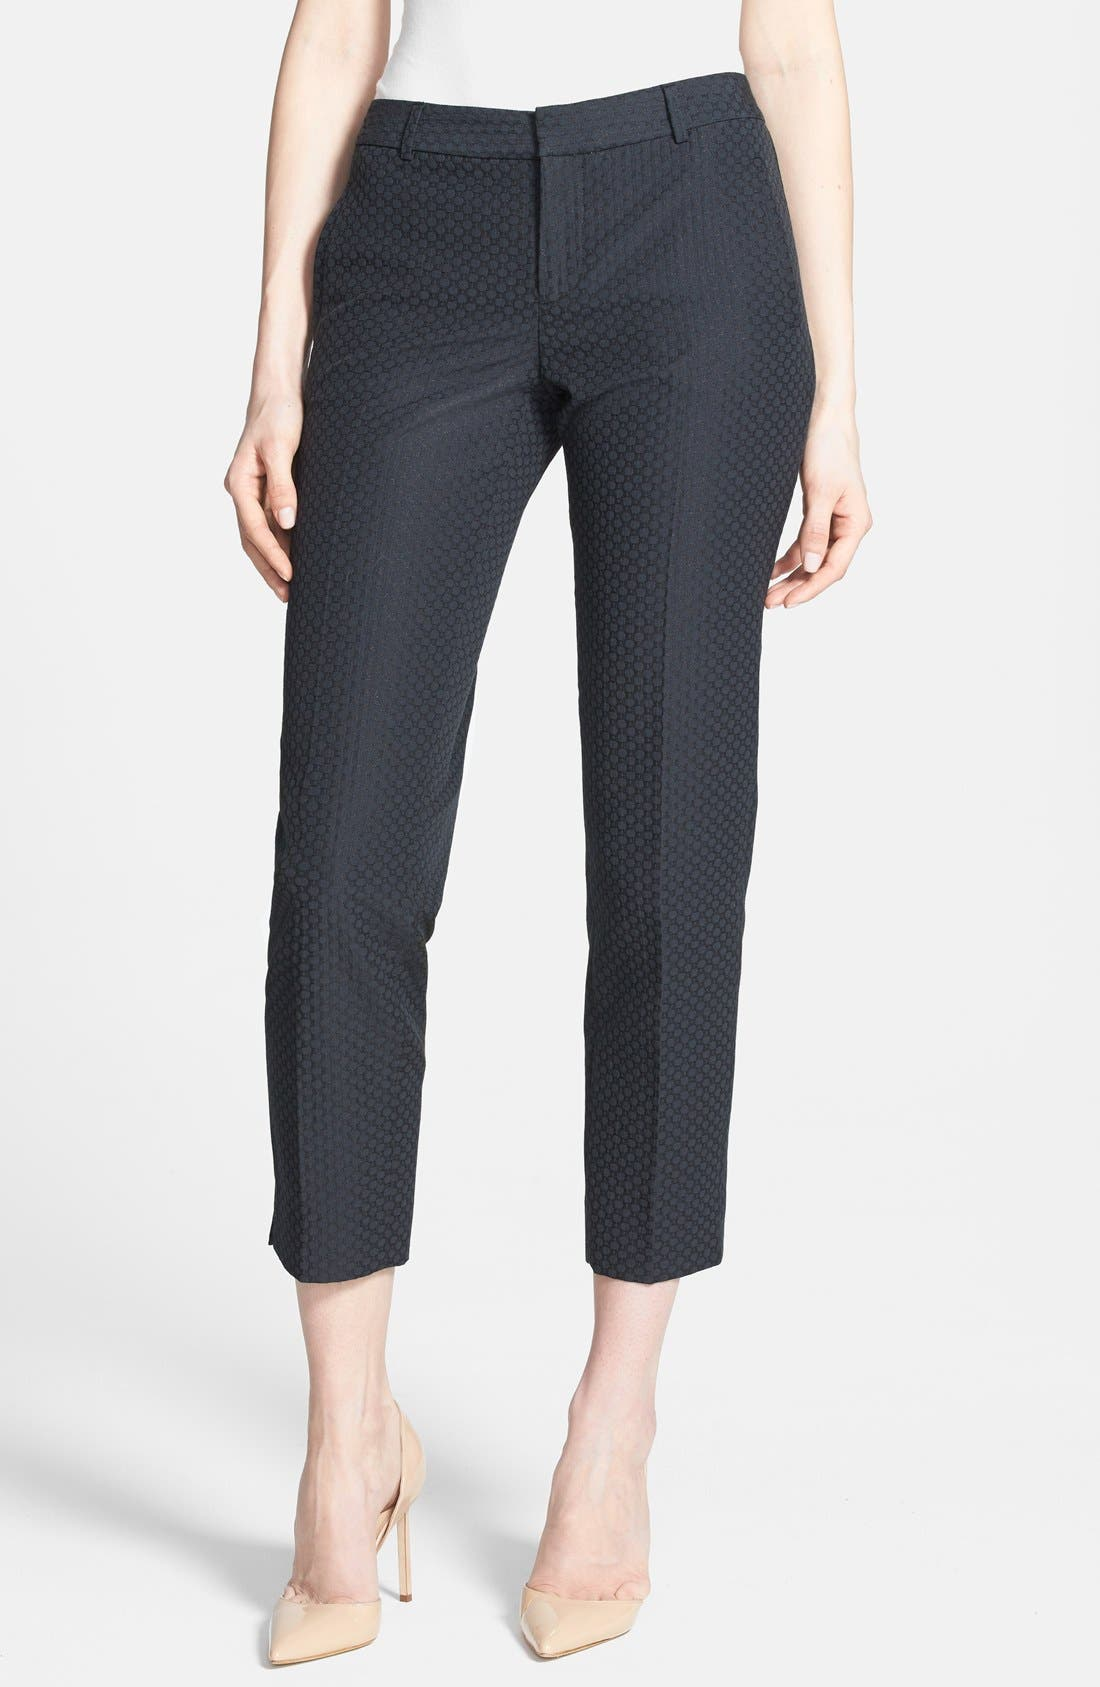 Alternate Image 1 Selected - Chelsea28 Slim Jacquard Crop Pants